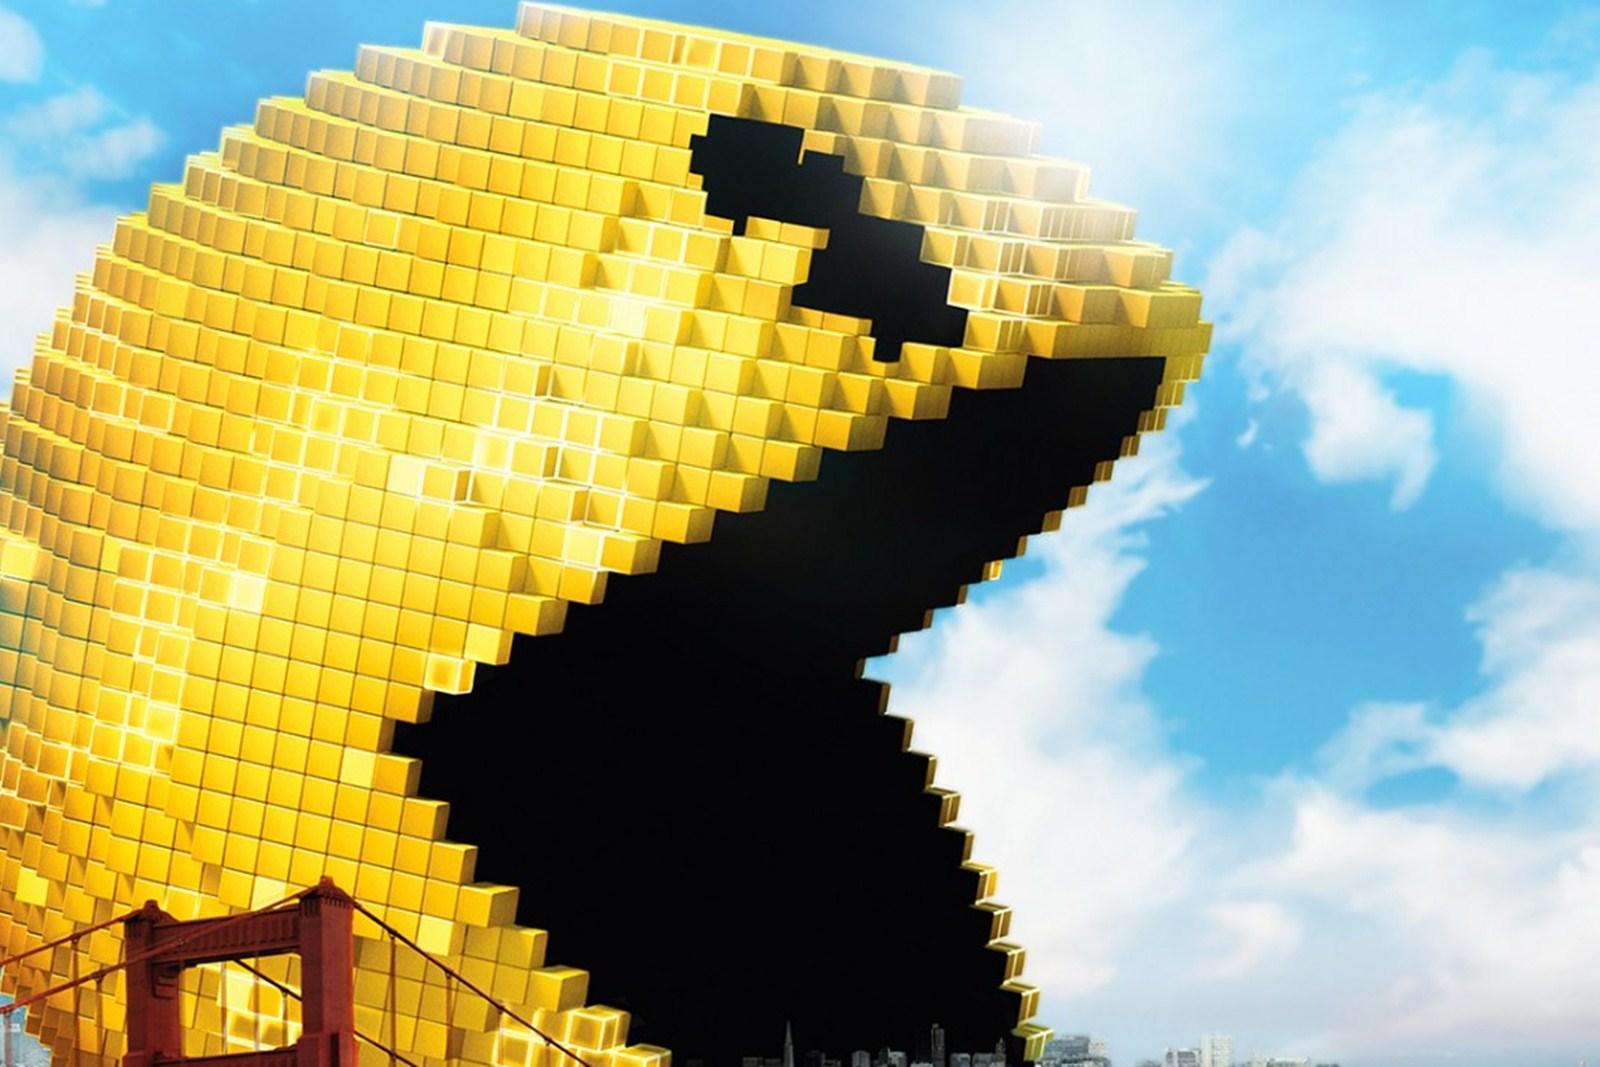 Pixels Movie 2015 HD Wallpapers Download 1600x1067